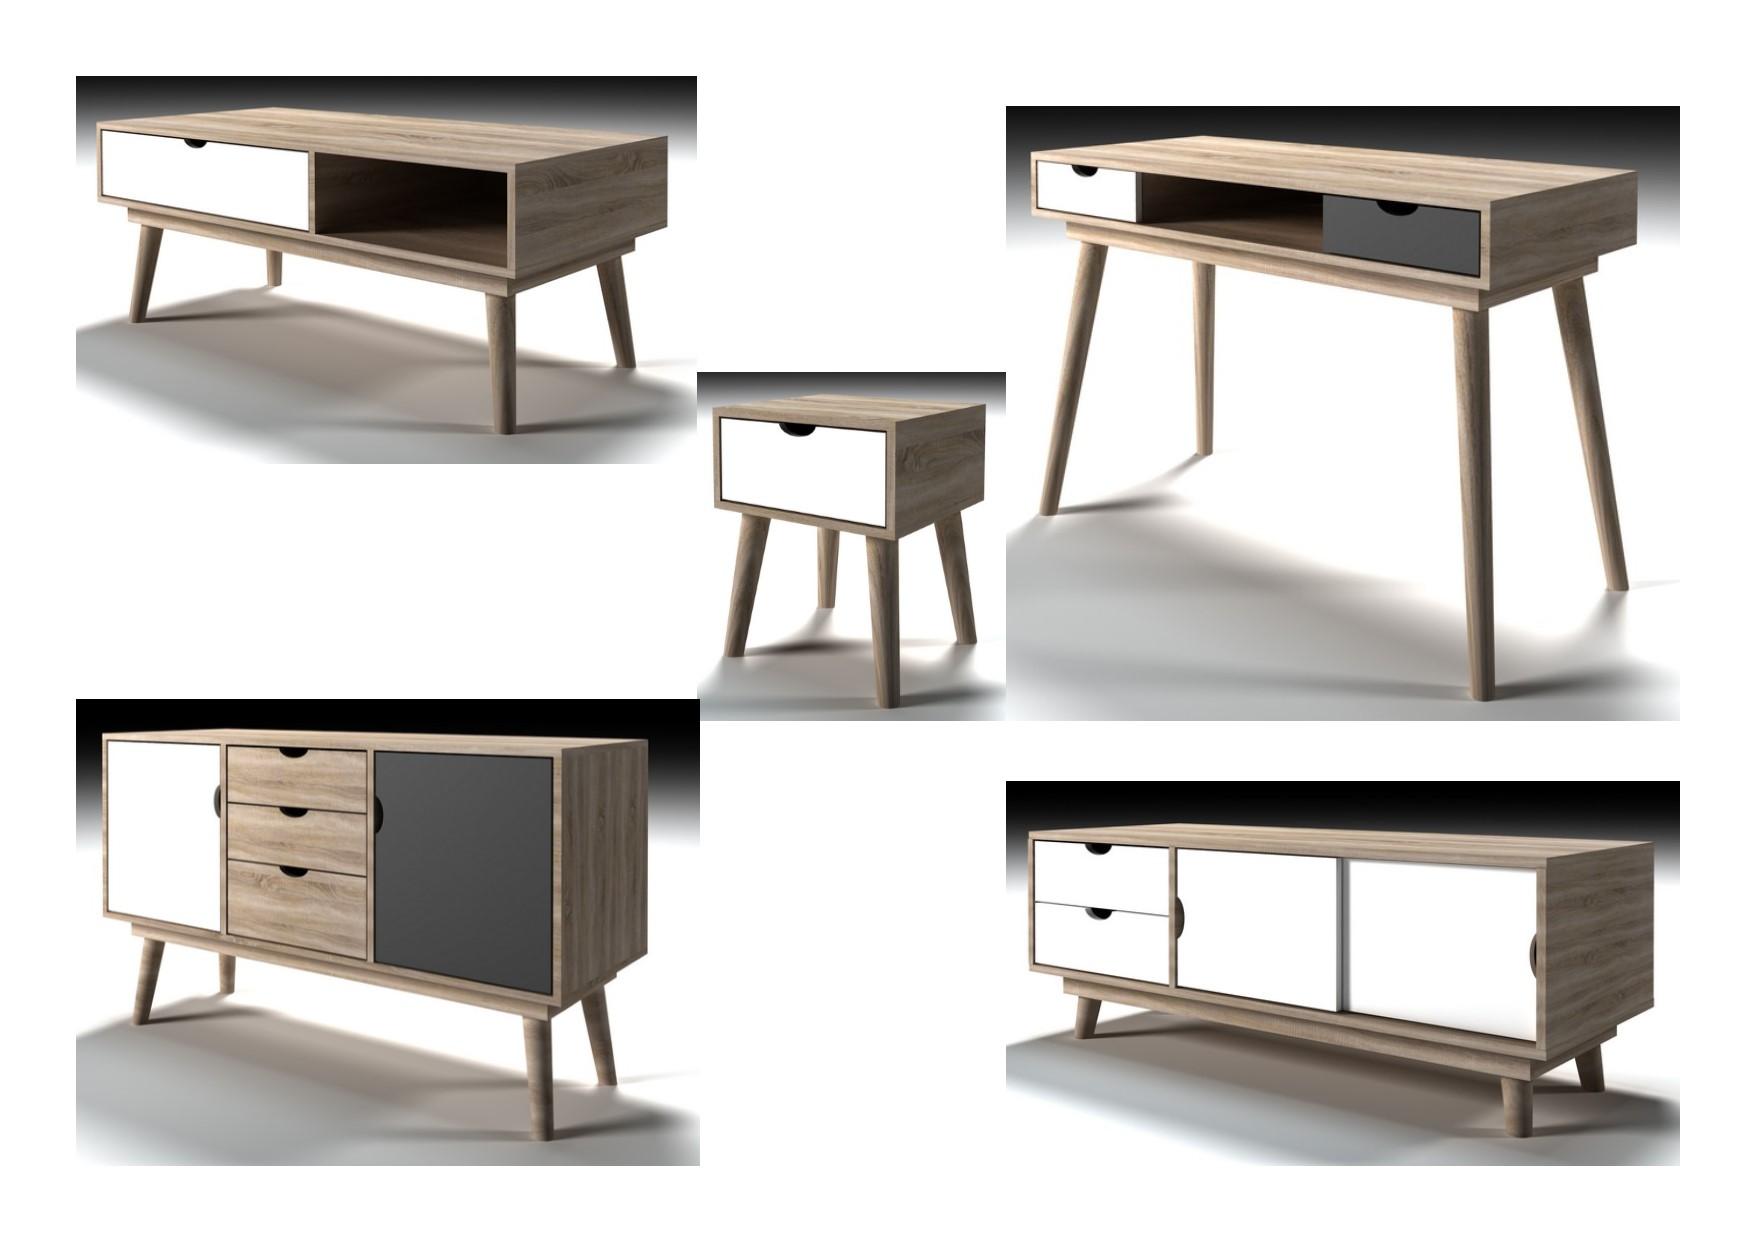 Lpd Scandi Retro Living Room Furniture Sideboard Desk Table Oak White Or Grey Ebay